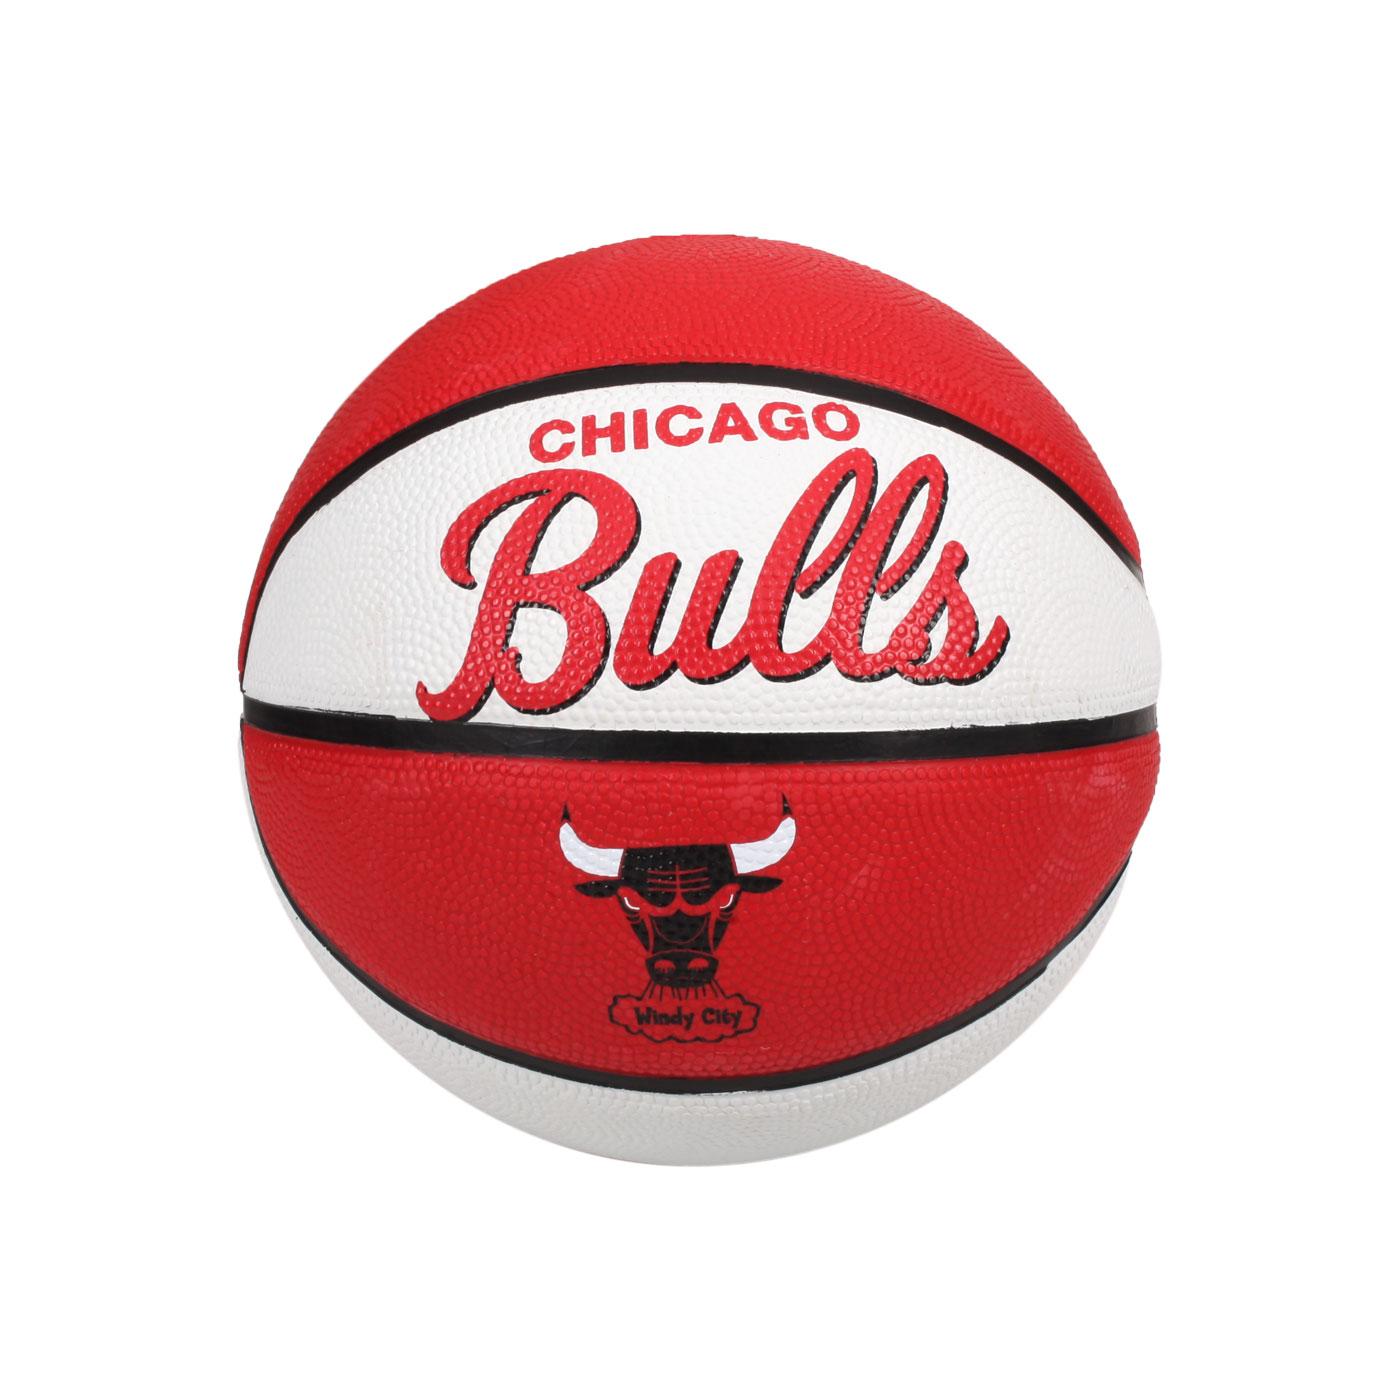 WILSON NBA隊徽系列橡膠籃球-復古公牛隊#3 WTB3200XBCHI - 白紅黑